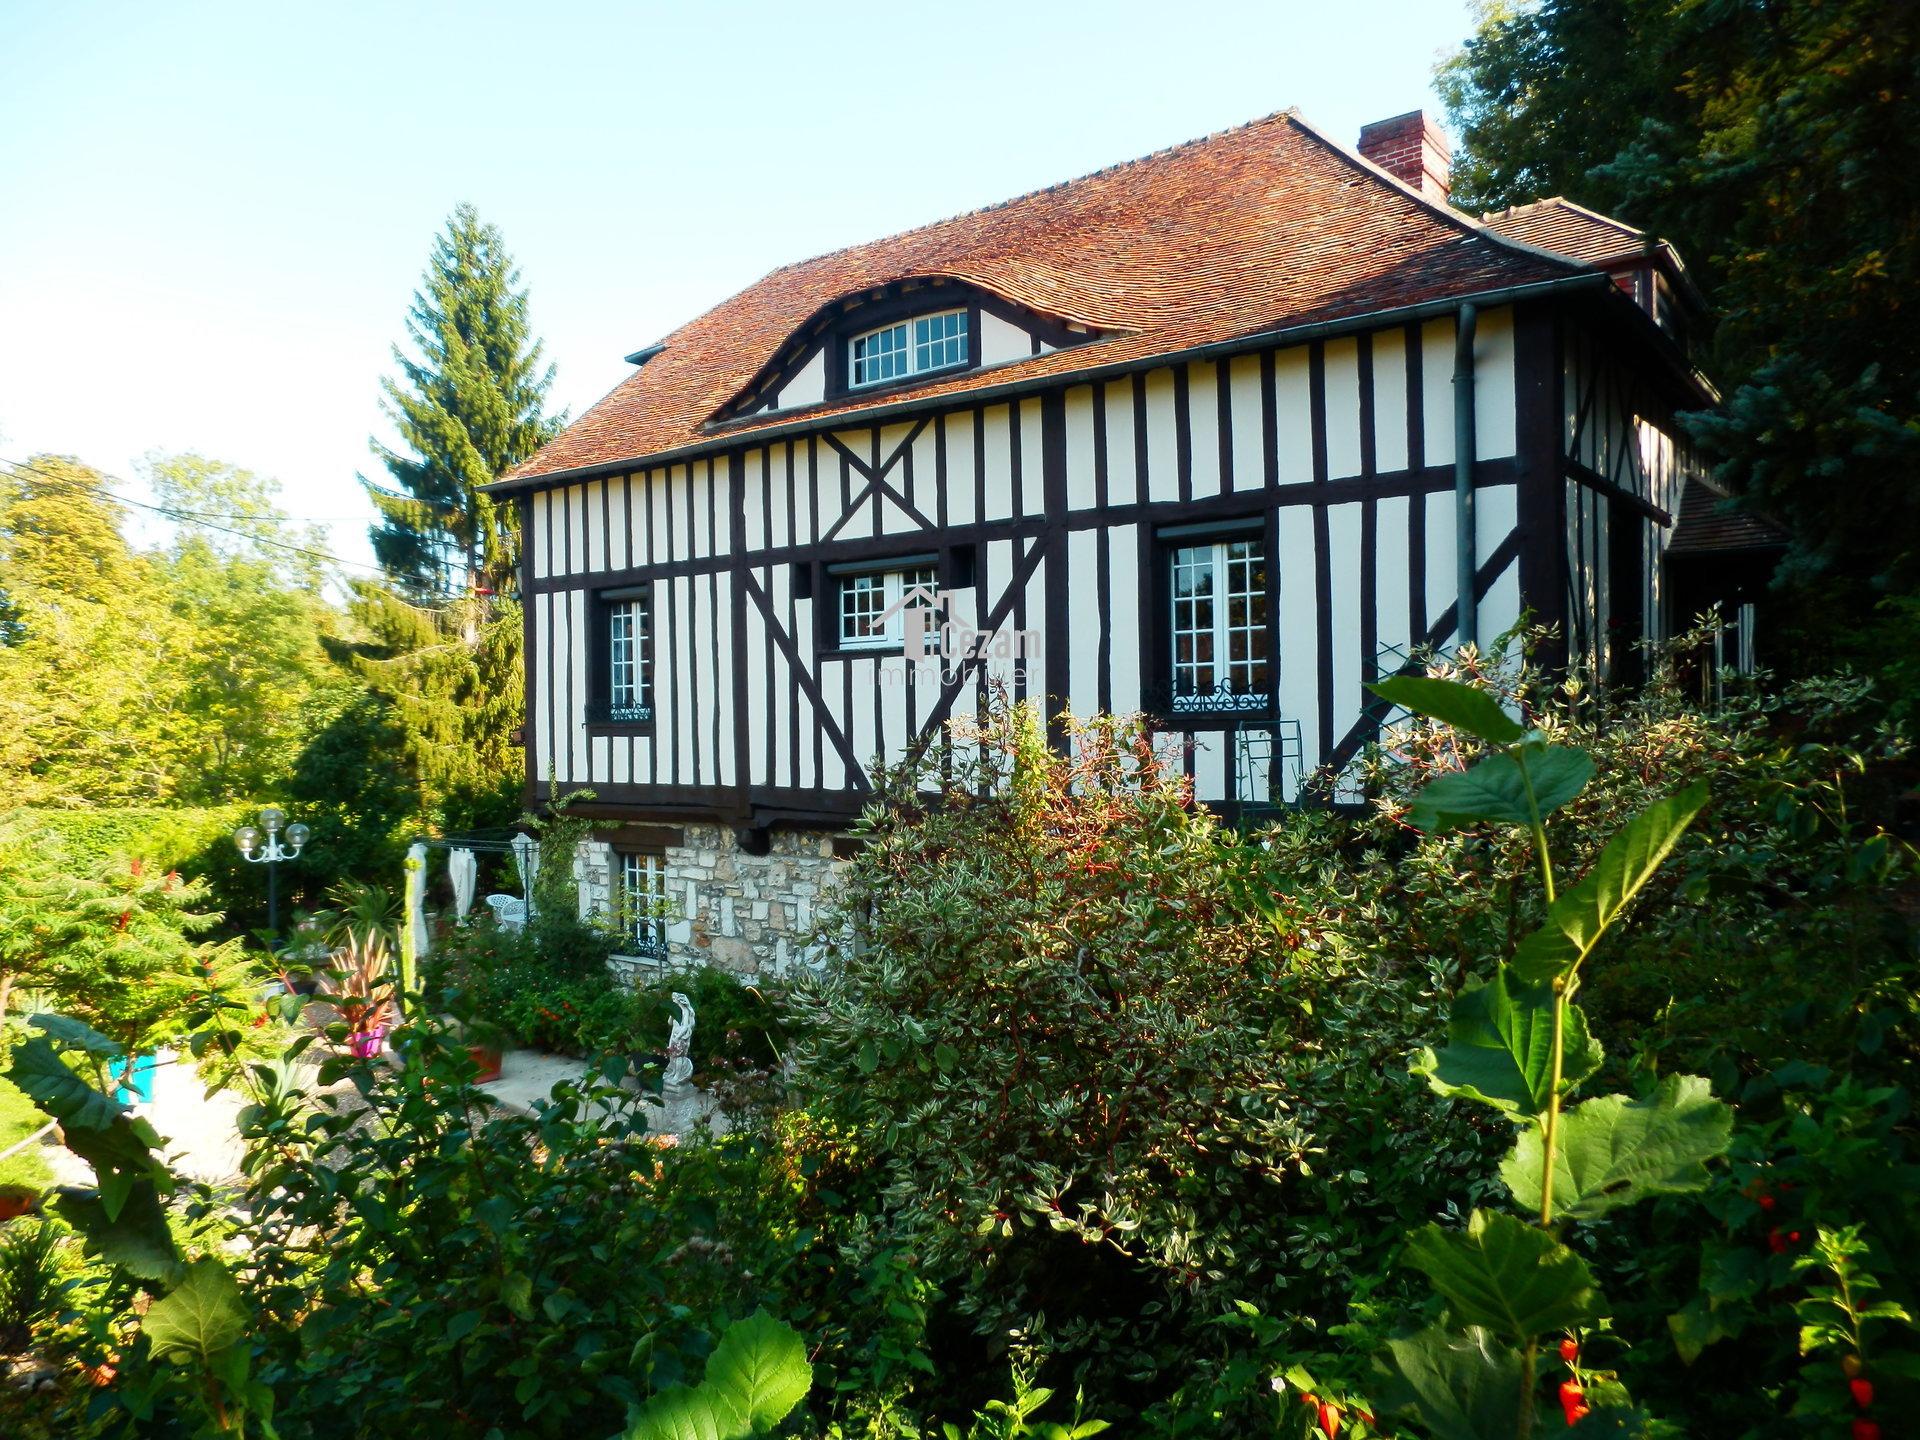 Charmante maison normande